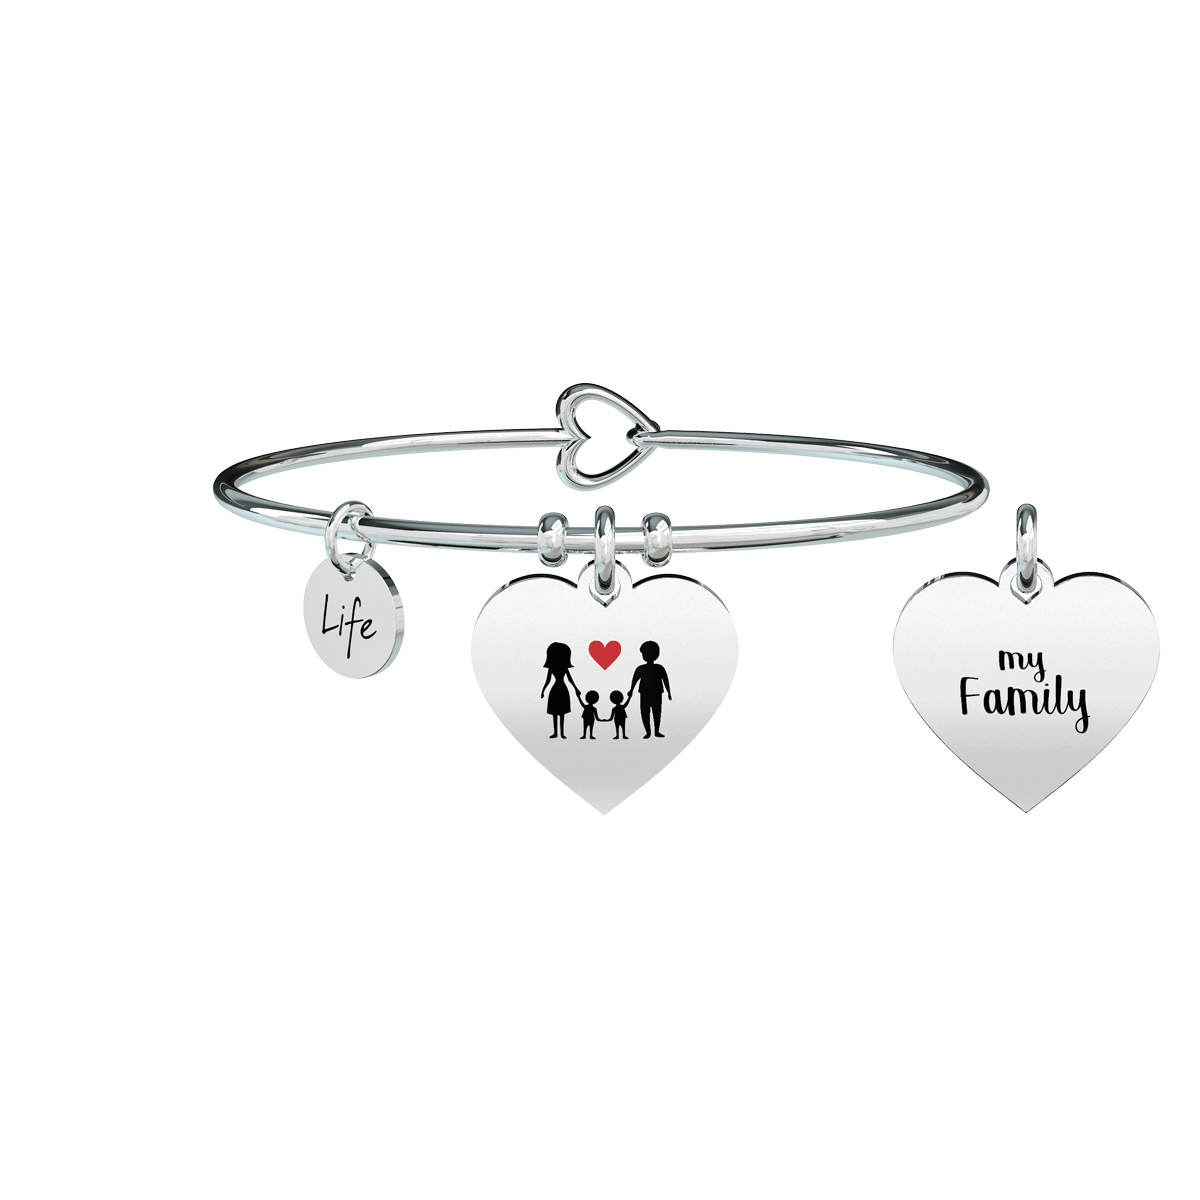 Kidult bracciale Family donna